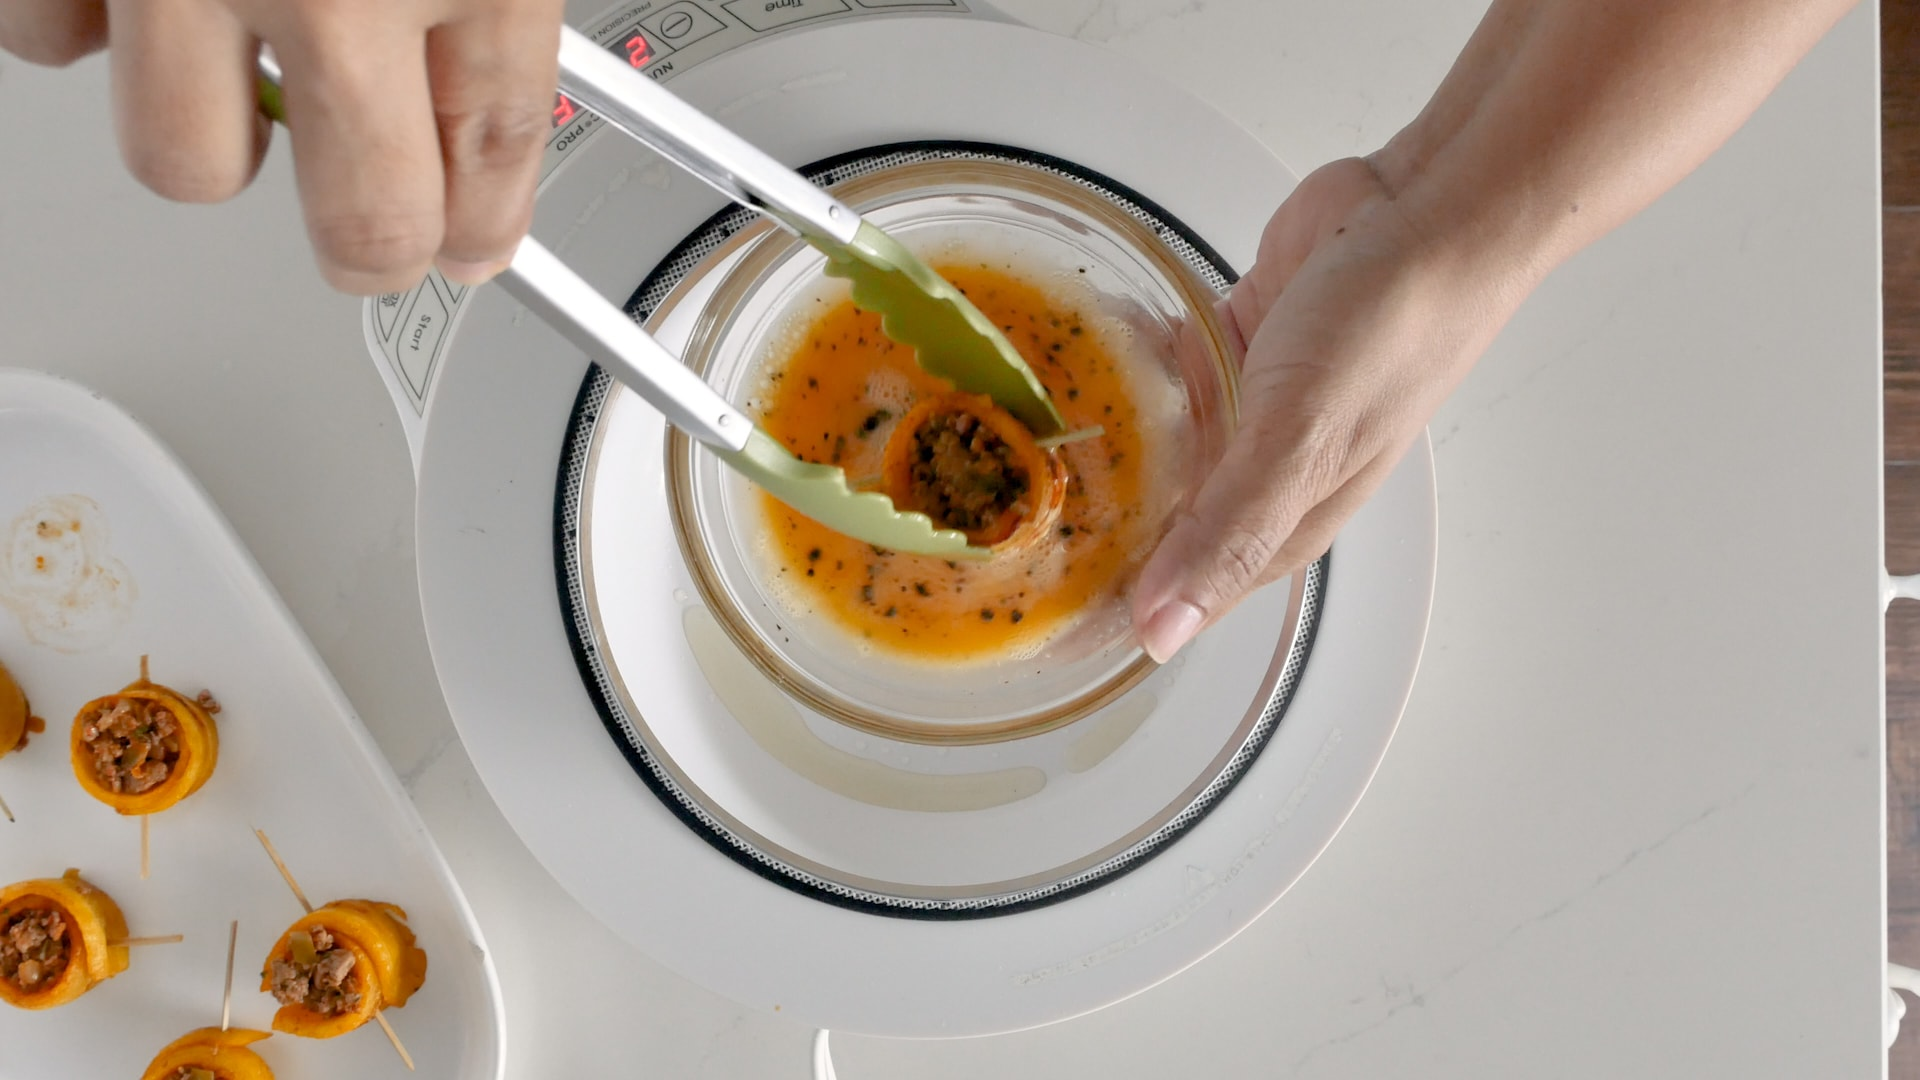 Frying pionono rolls